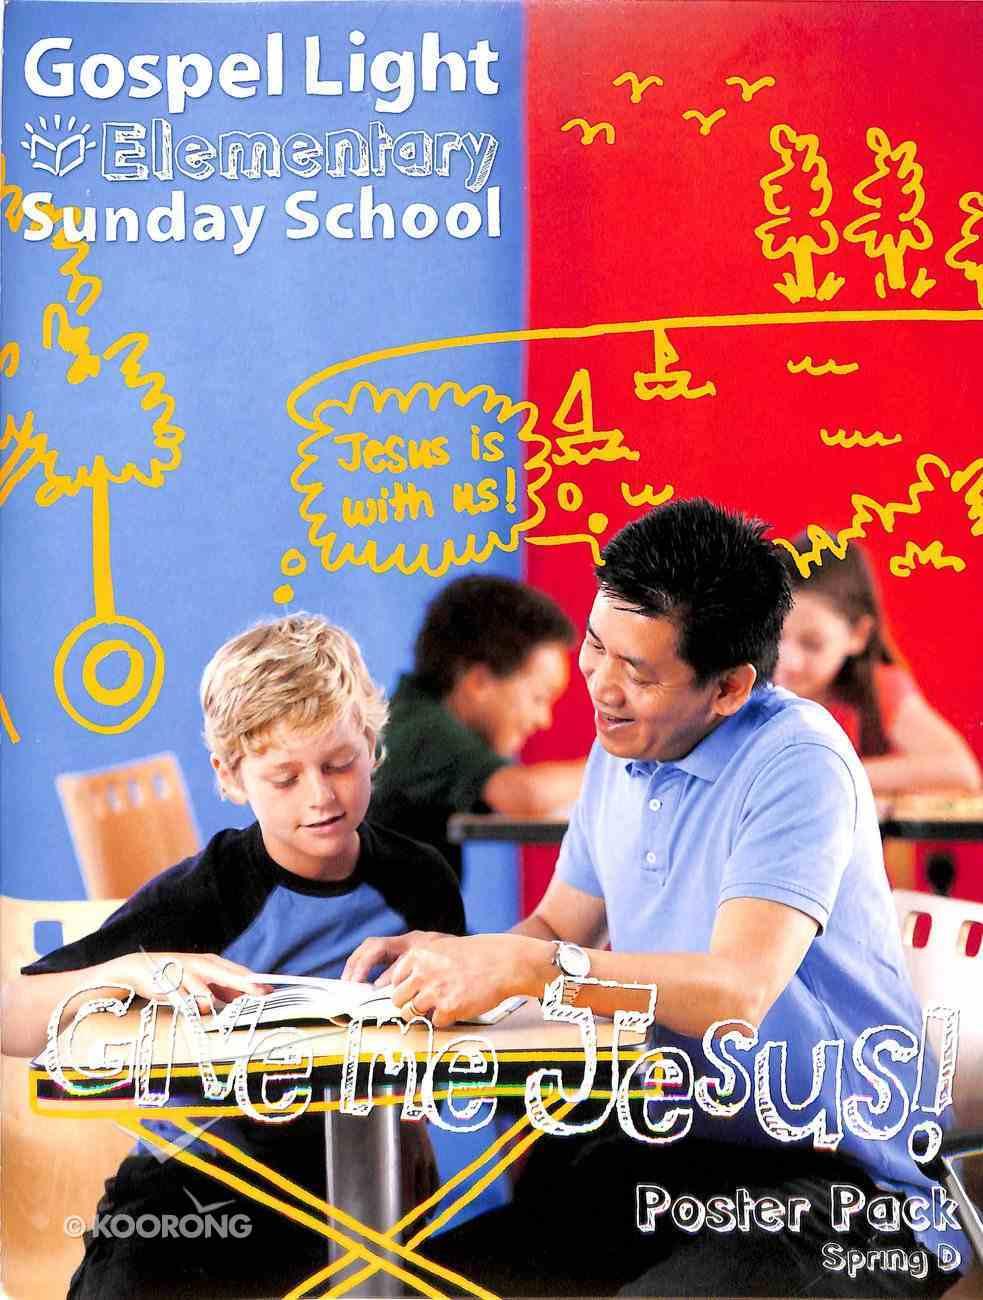 Gllw Spring D 2019 Grades 1-4 Bible Teaching Poster Pack (Gospel Light Living Word Series) Poster